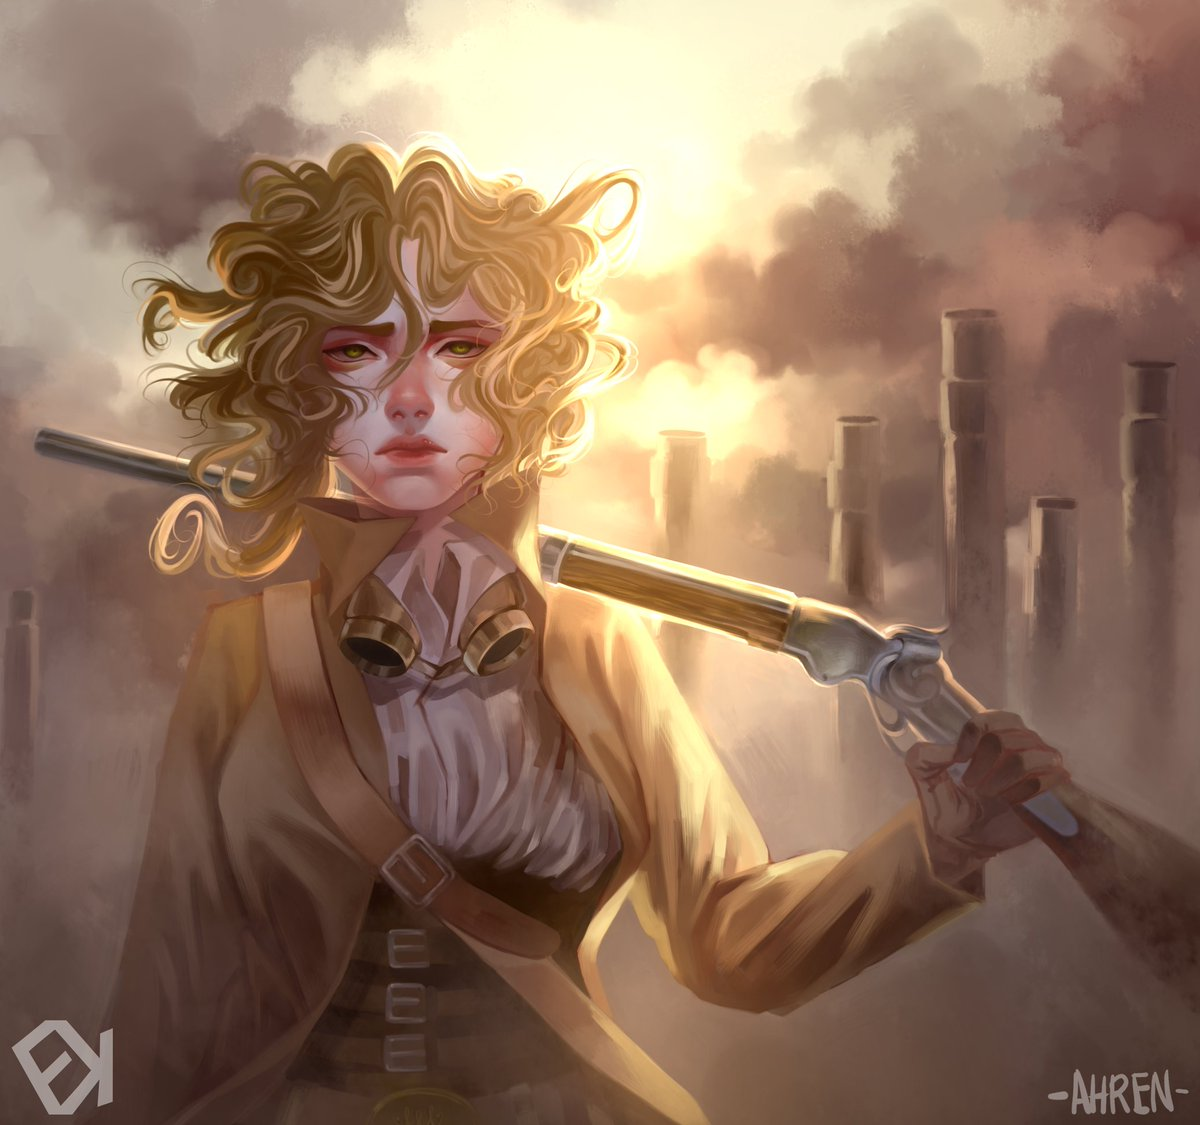 #Artwork Awesome of the Day: #Steampunk ⚙️ #Fanart #Illustration 🖼️ By Briar Wilkes From @cmpriest's #Boneshaker #ScienceFiction #Novel via @EvokStudios #SamaArt